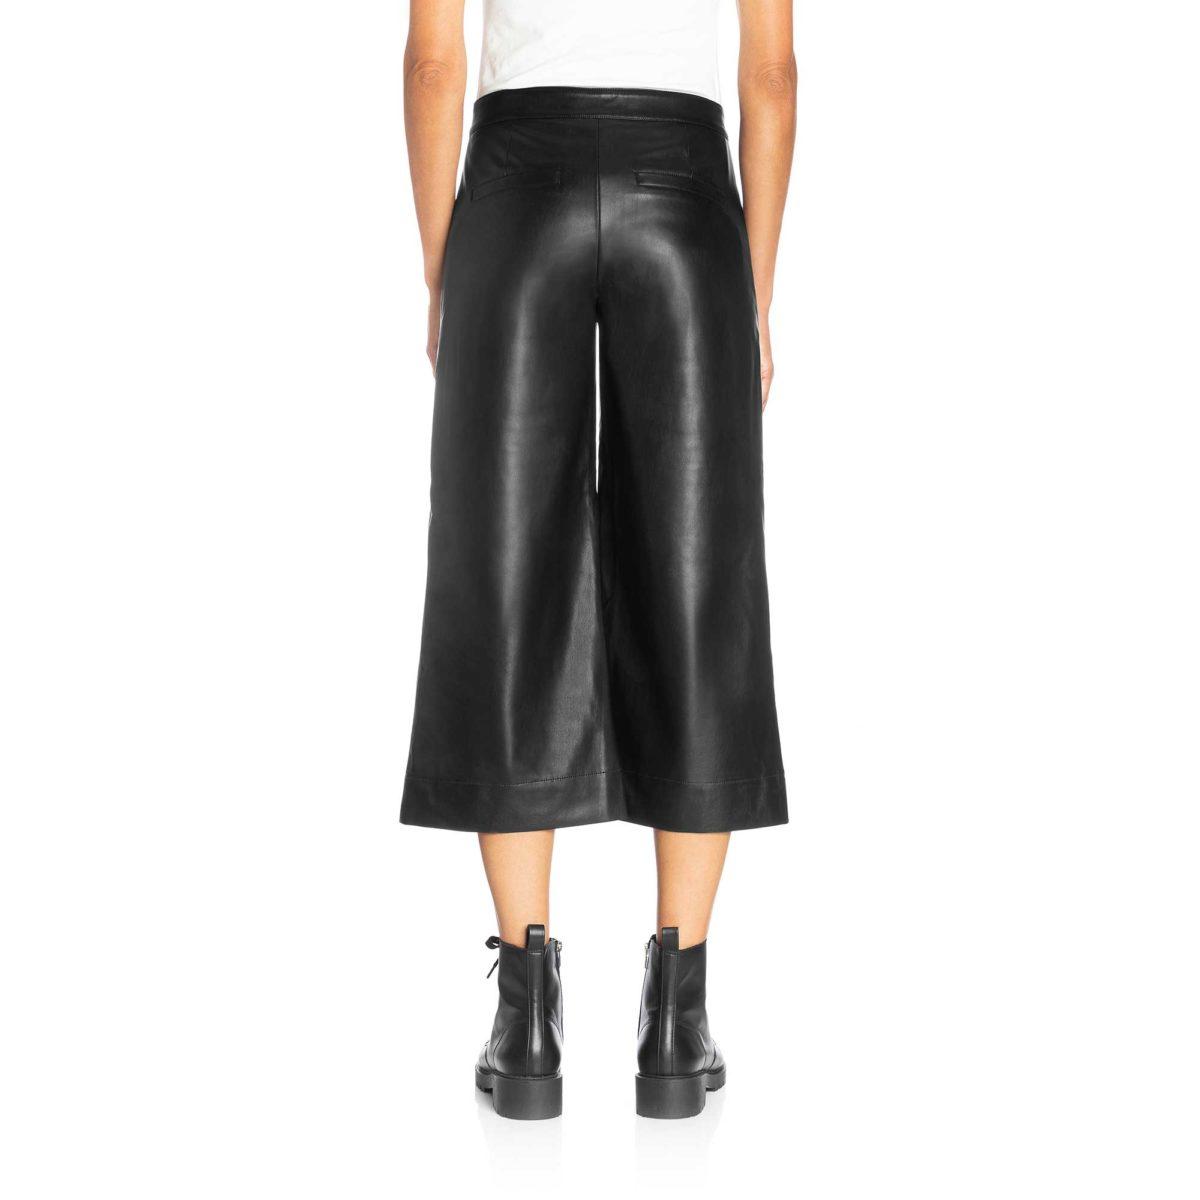 Pantalone Gaucho effetto pelle Nero - Nicla